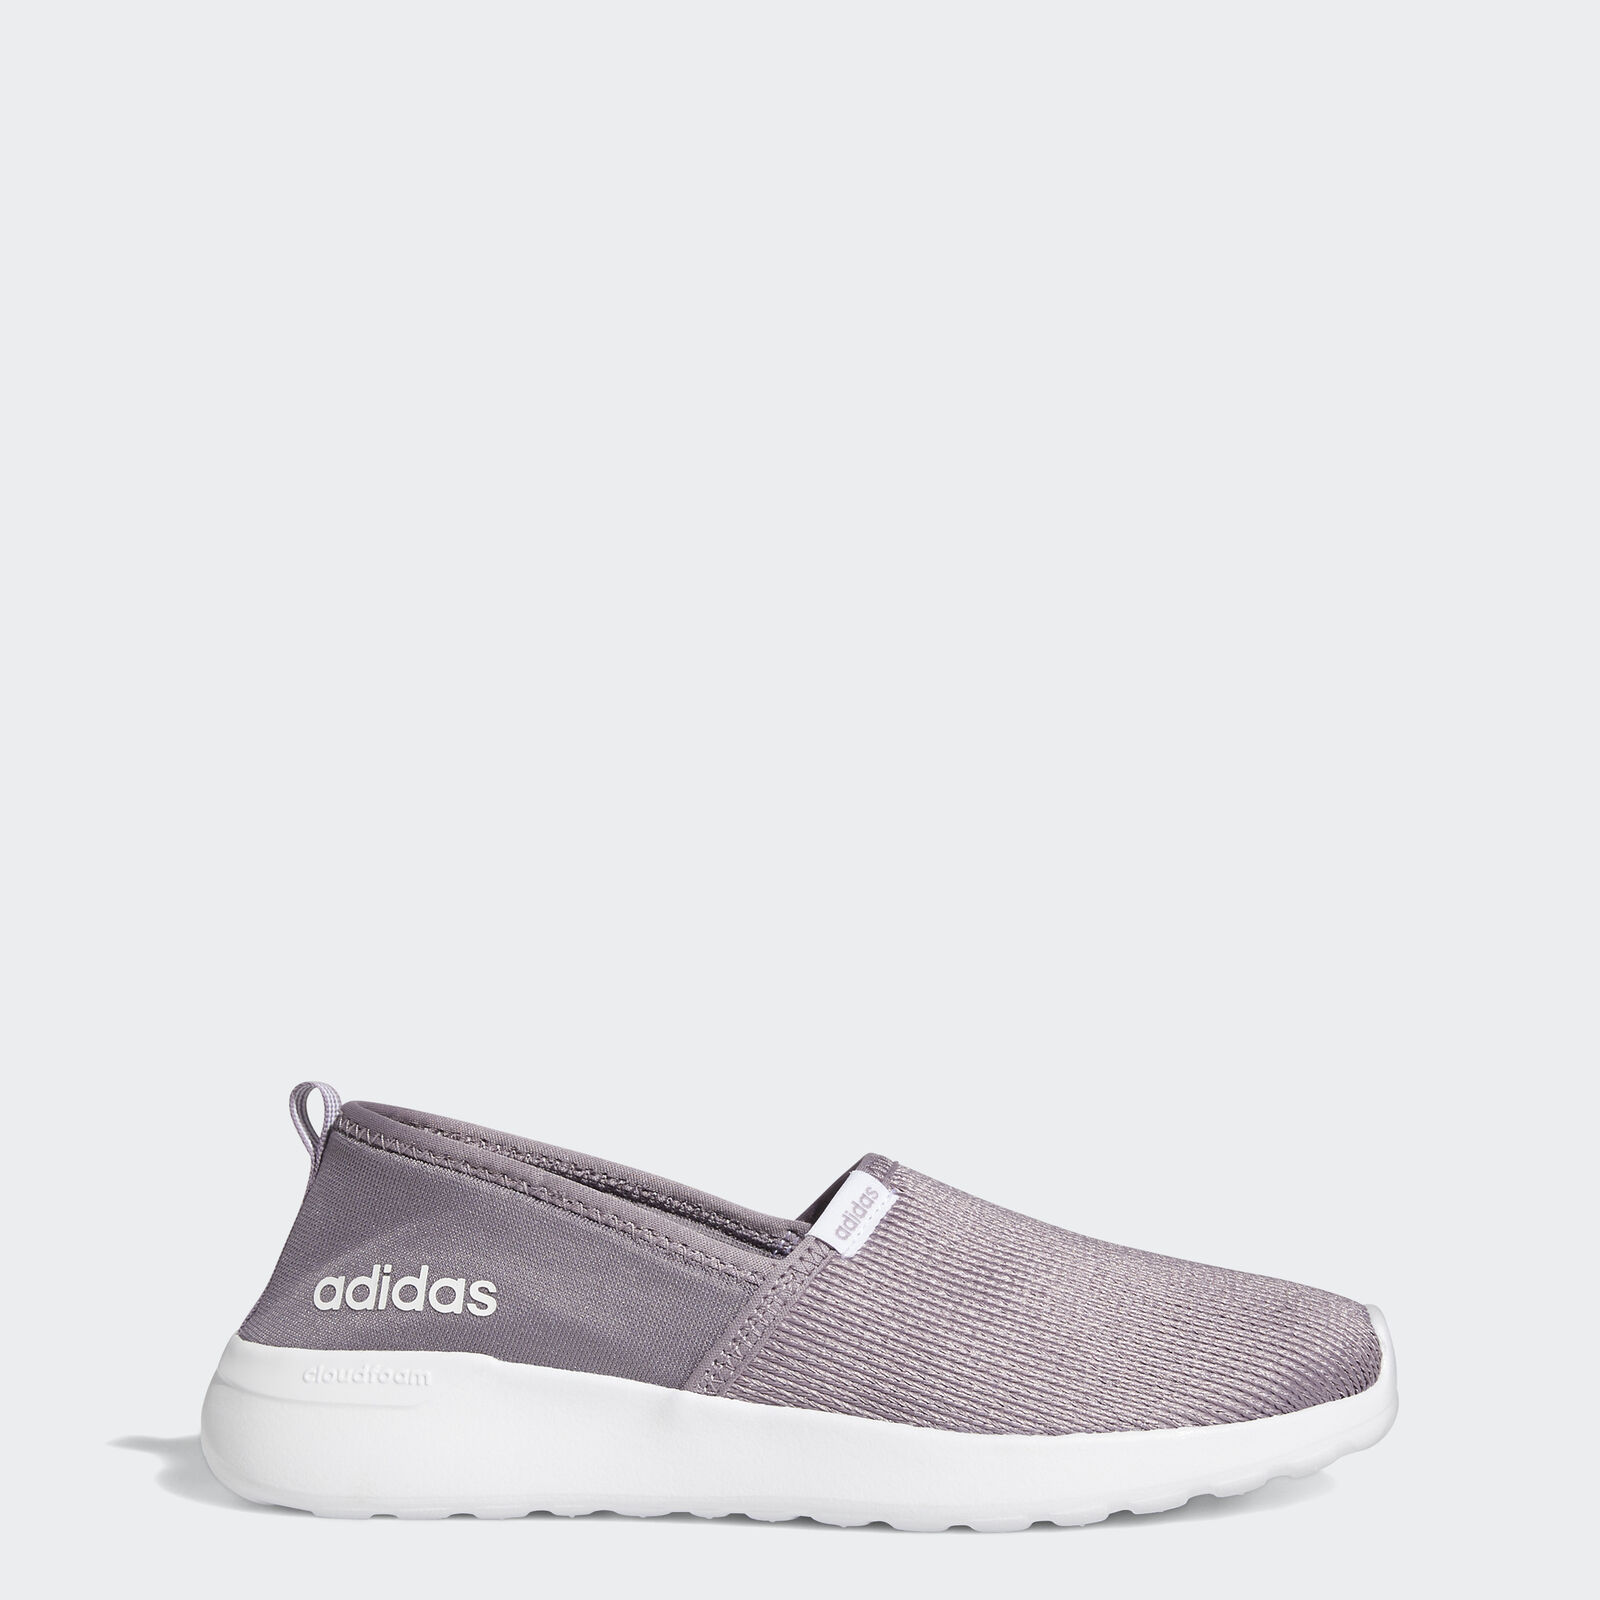 Adidas-Cloudfoam-Lite-Racer-Slip-On-Shoes-LAO69